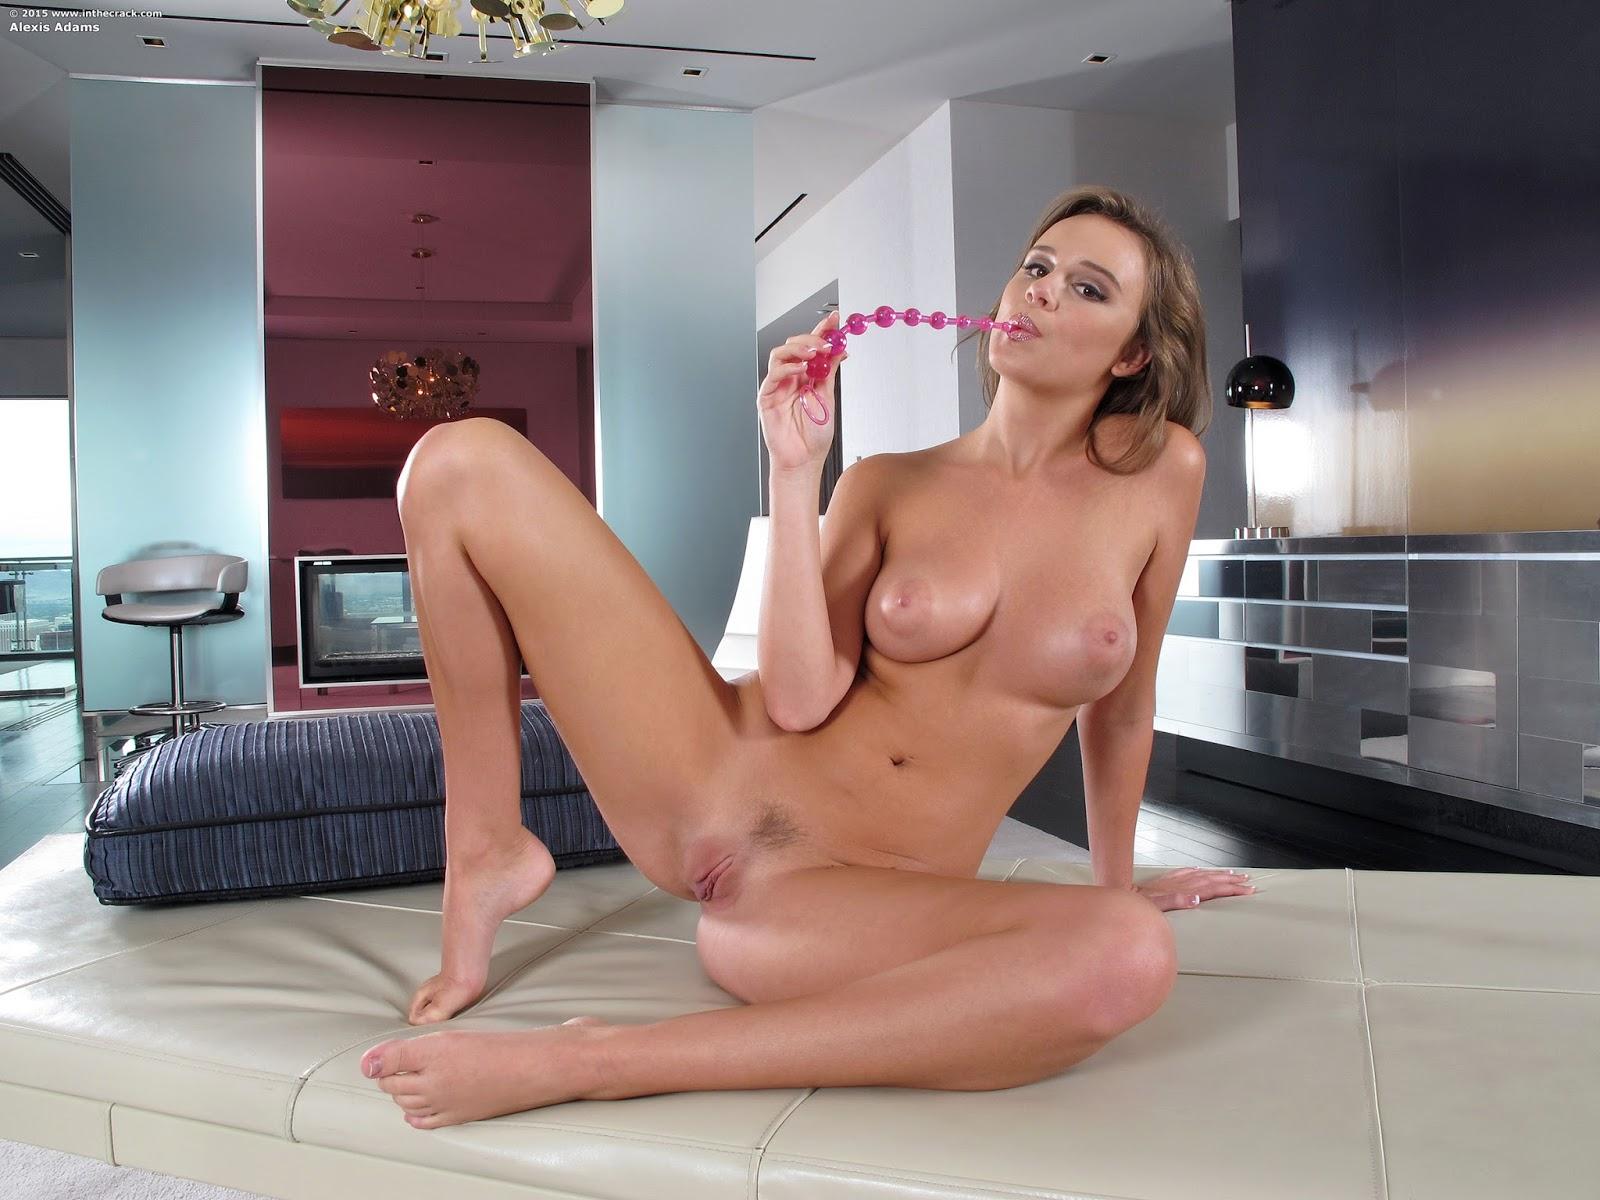 Alexis Adams занимается на веранде порно фото бесплатно